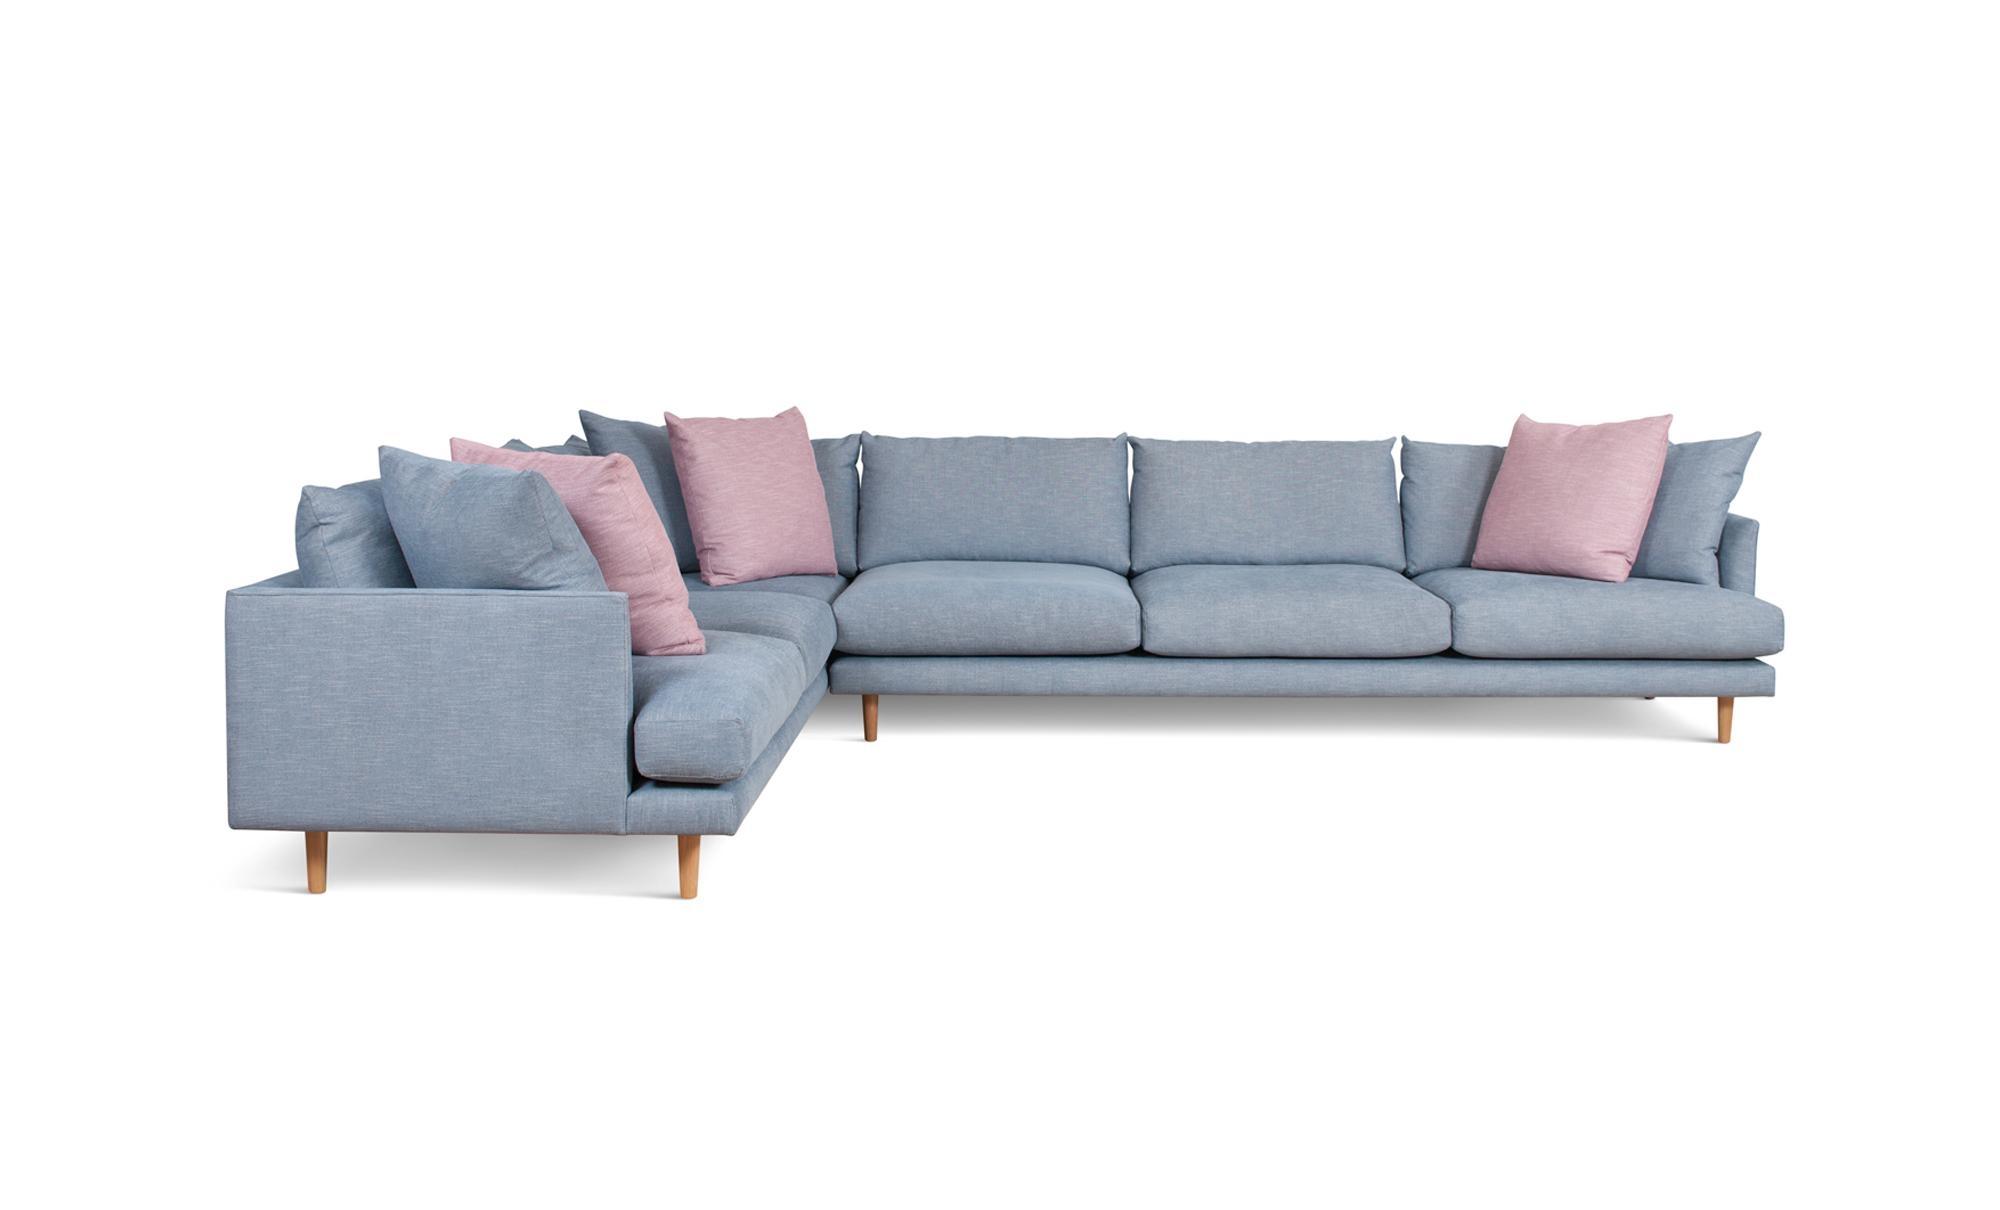 Modular Sofas – Fanuli Furniture With Modular Sofas (View 6 of 20)